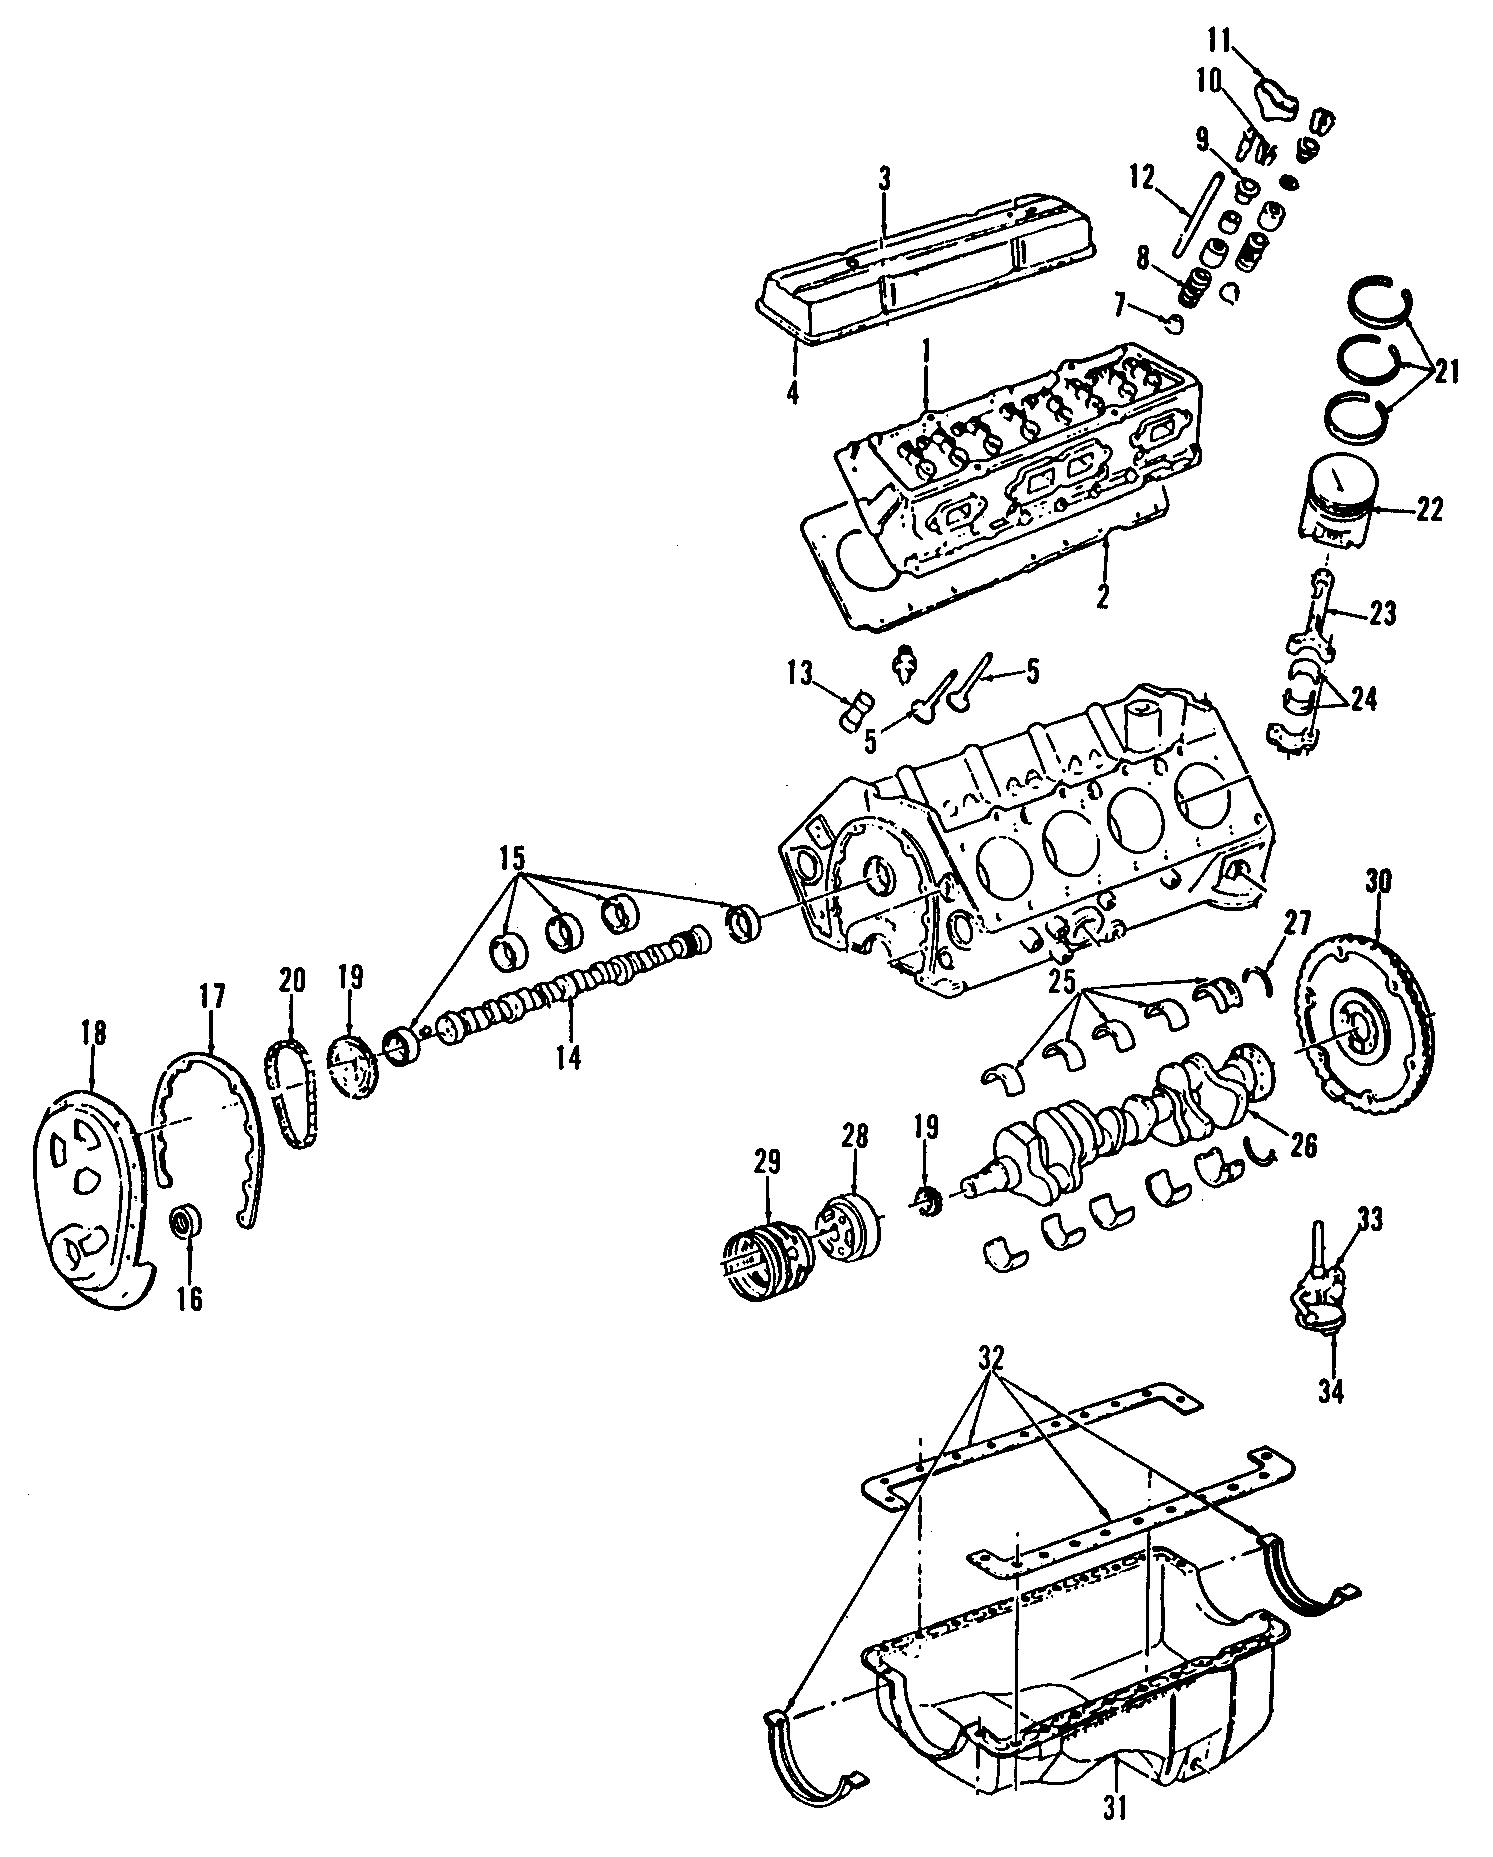 Chevrolet V10 Engine Harmonic Balancer Dampener Engine